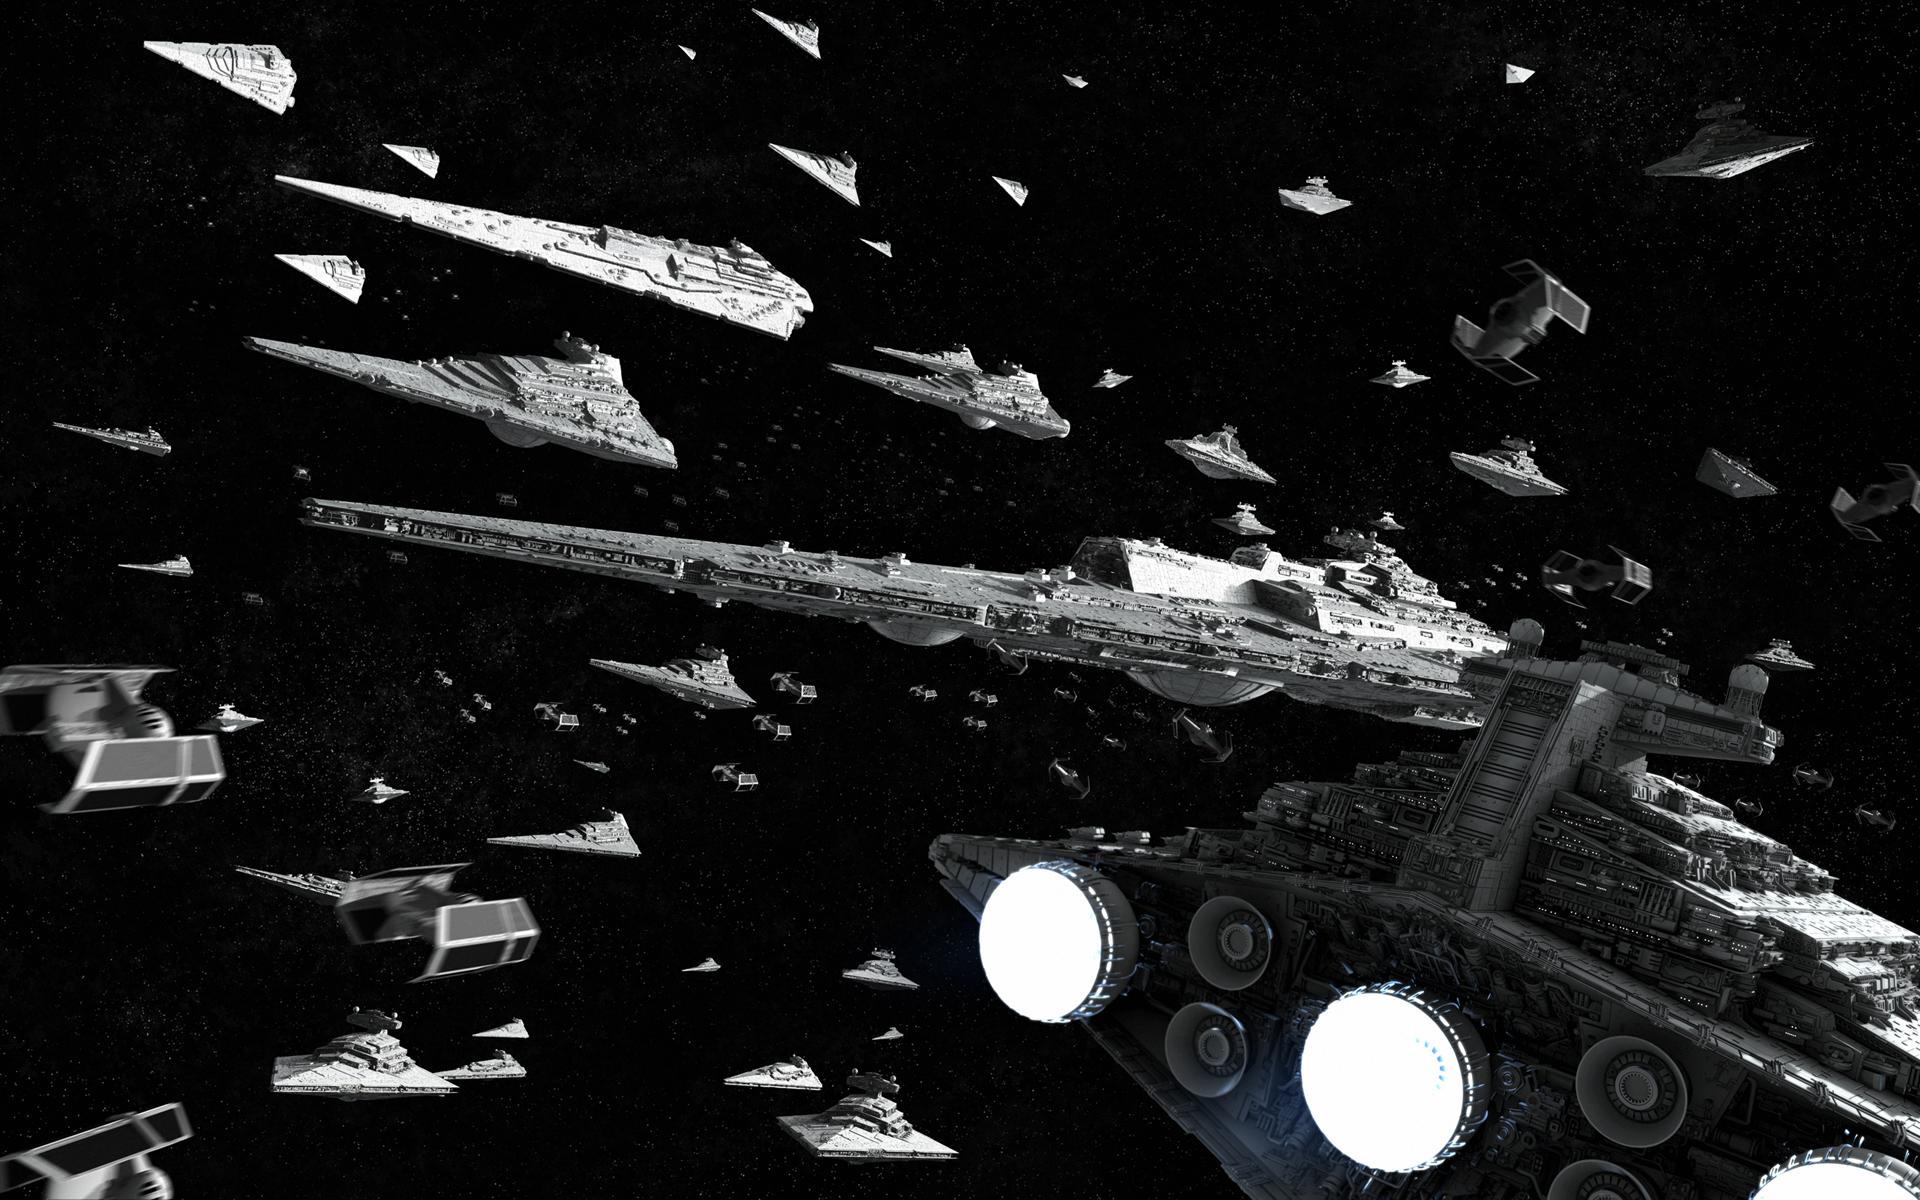 General 1920x1200 Star Wars movies Star Destroyer Super Star Destroyer fleet render science fiction CGI TIE Advanced Bellator-class dreadnought Star Wars Ships Imperial Forces